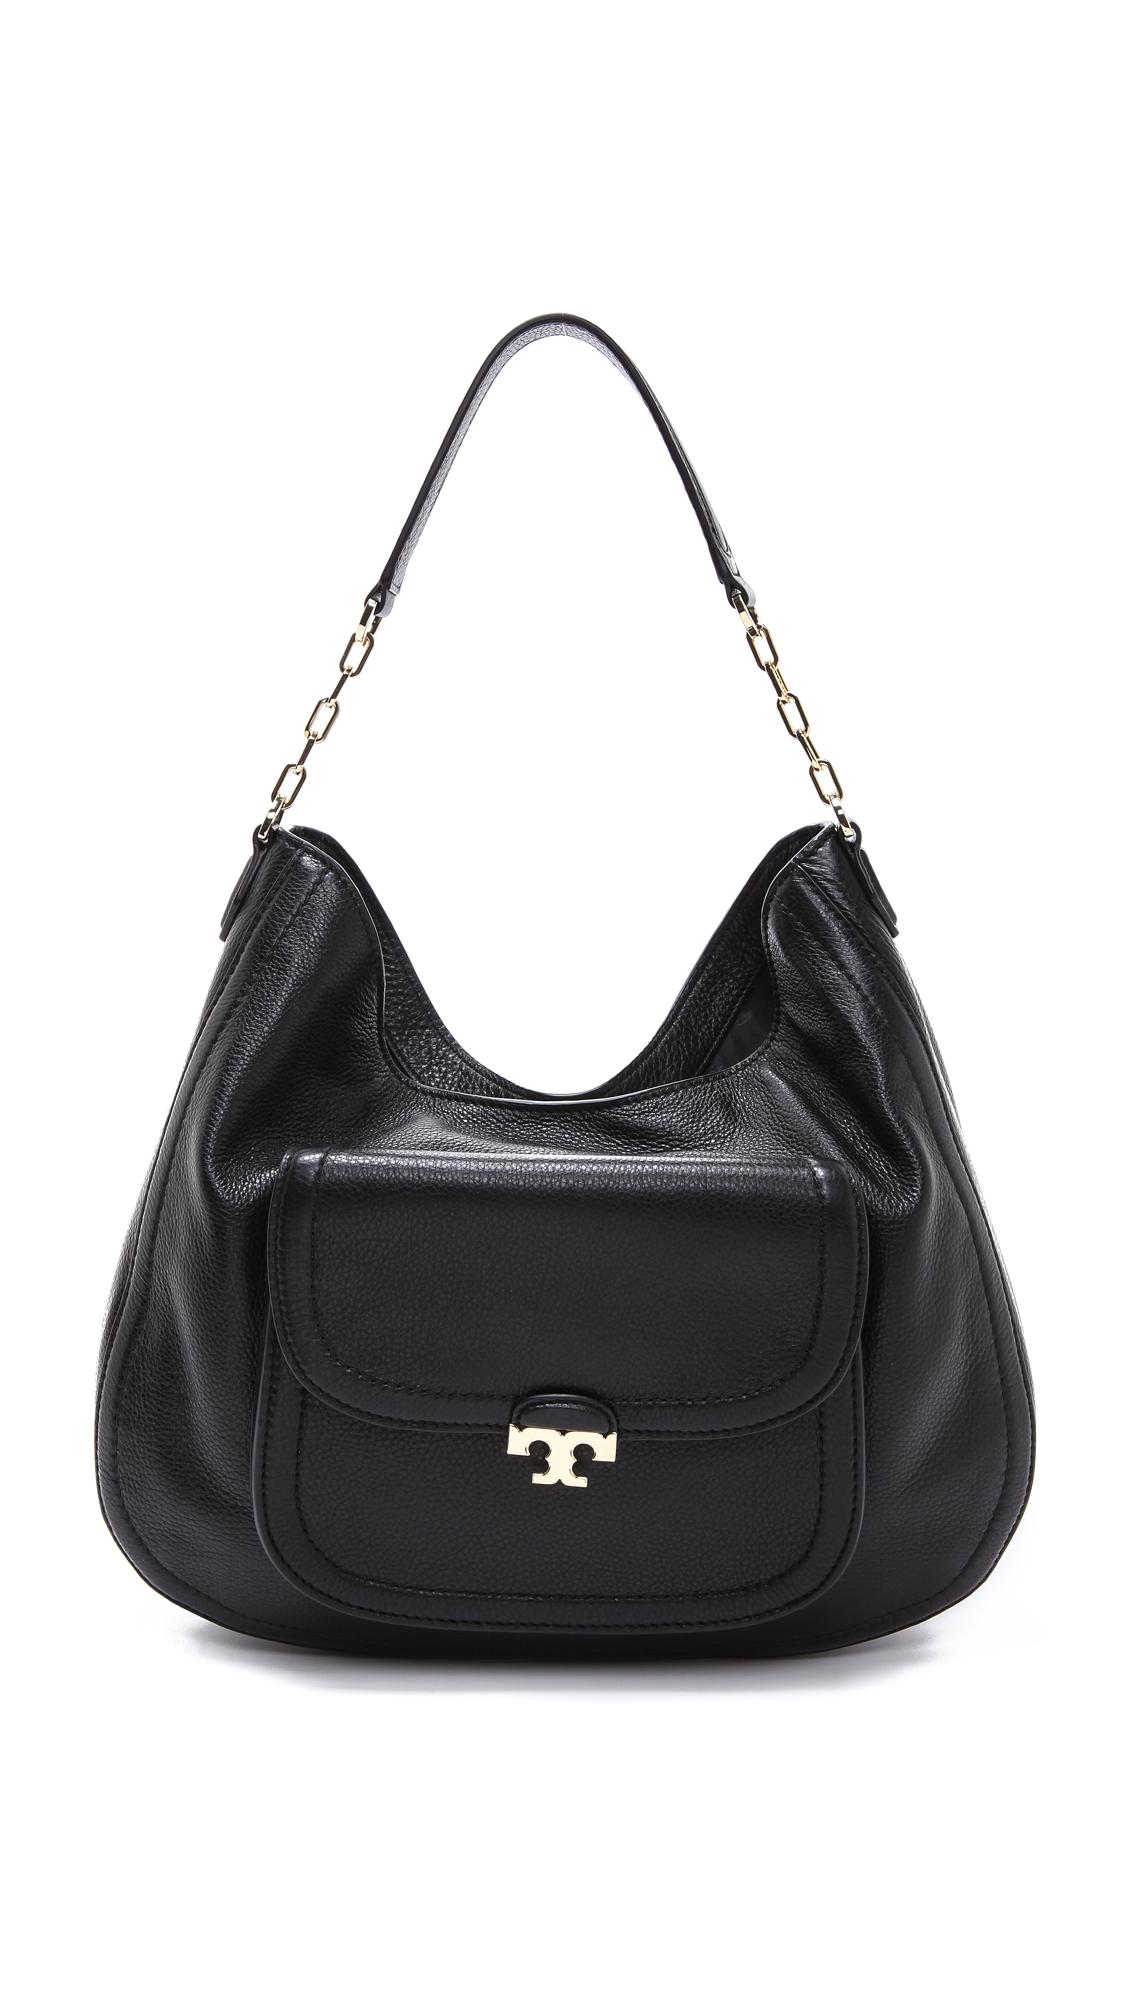 4e30b82a283f Lyst - Tory Burch Sammy Hobo Bag in Black